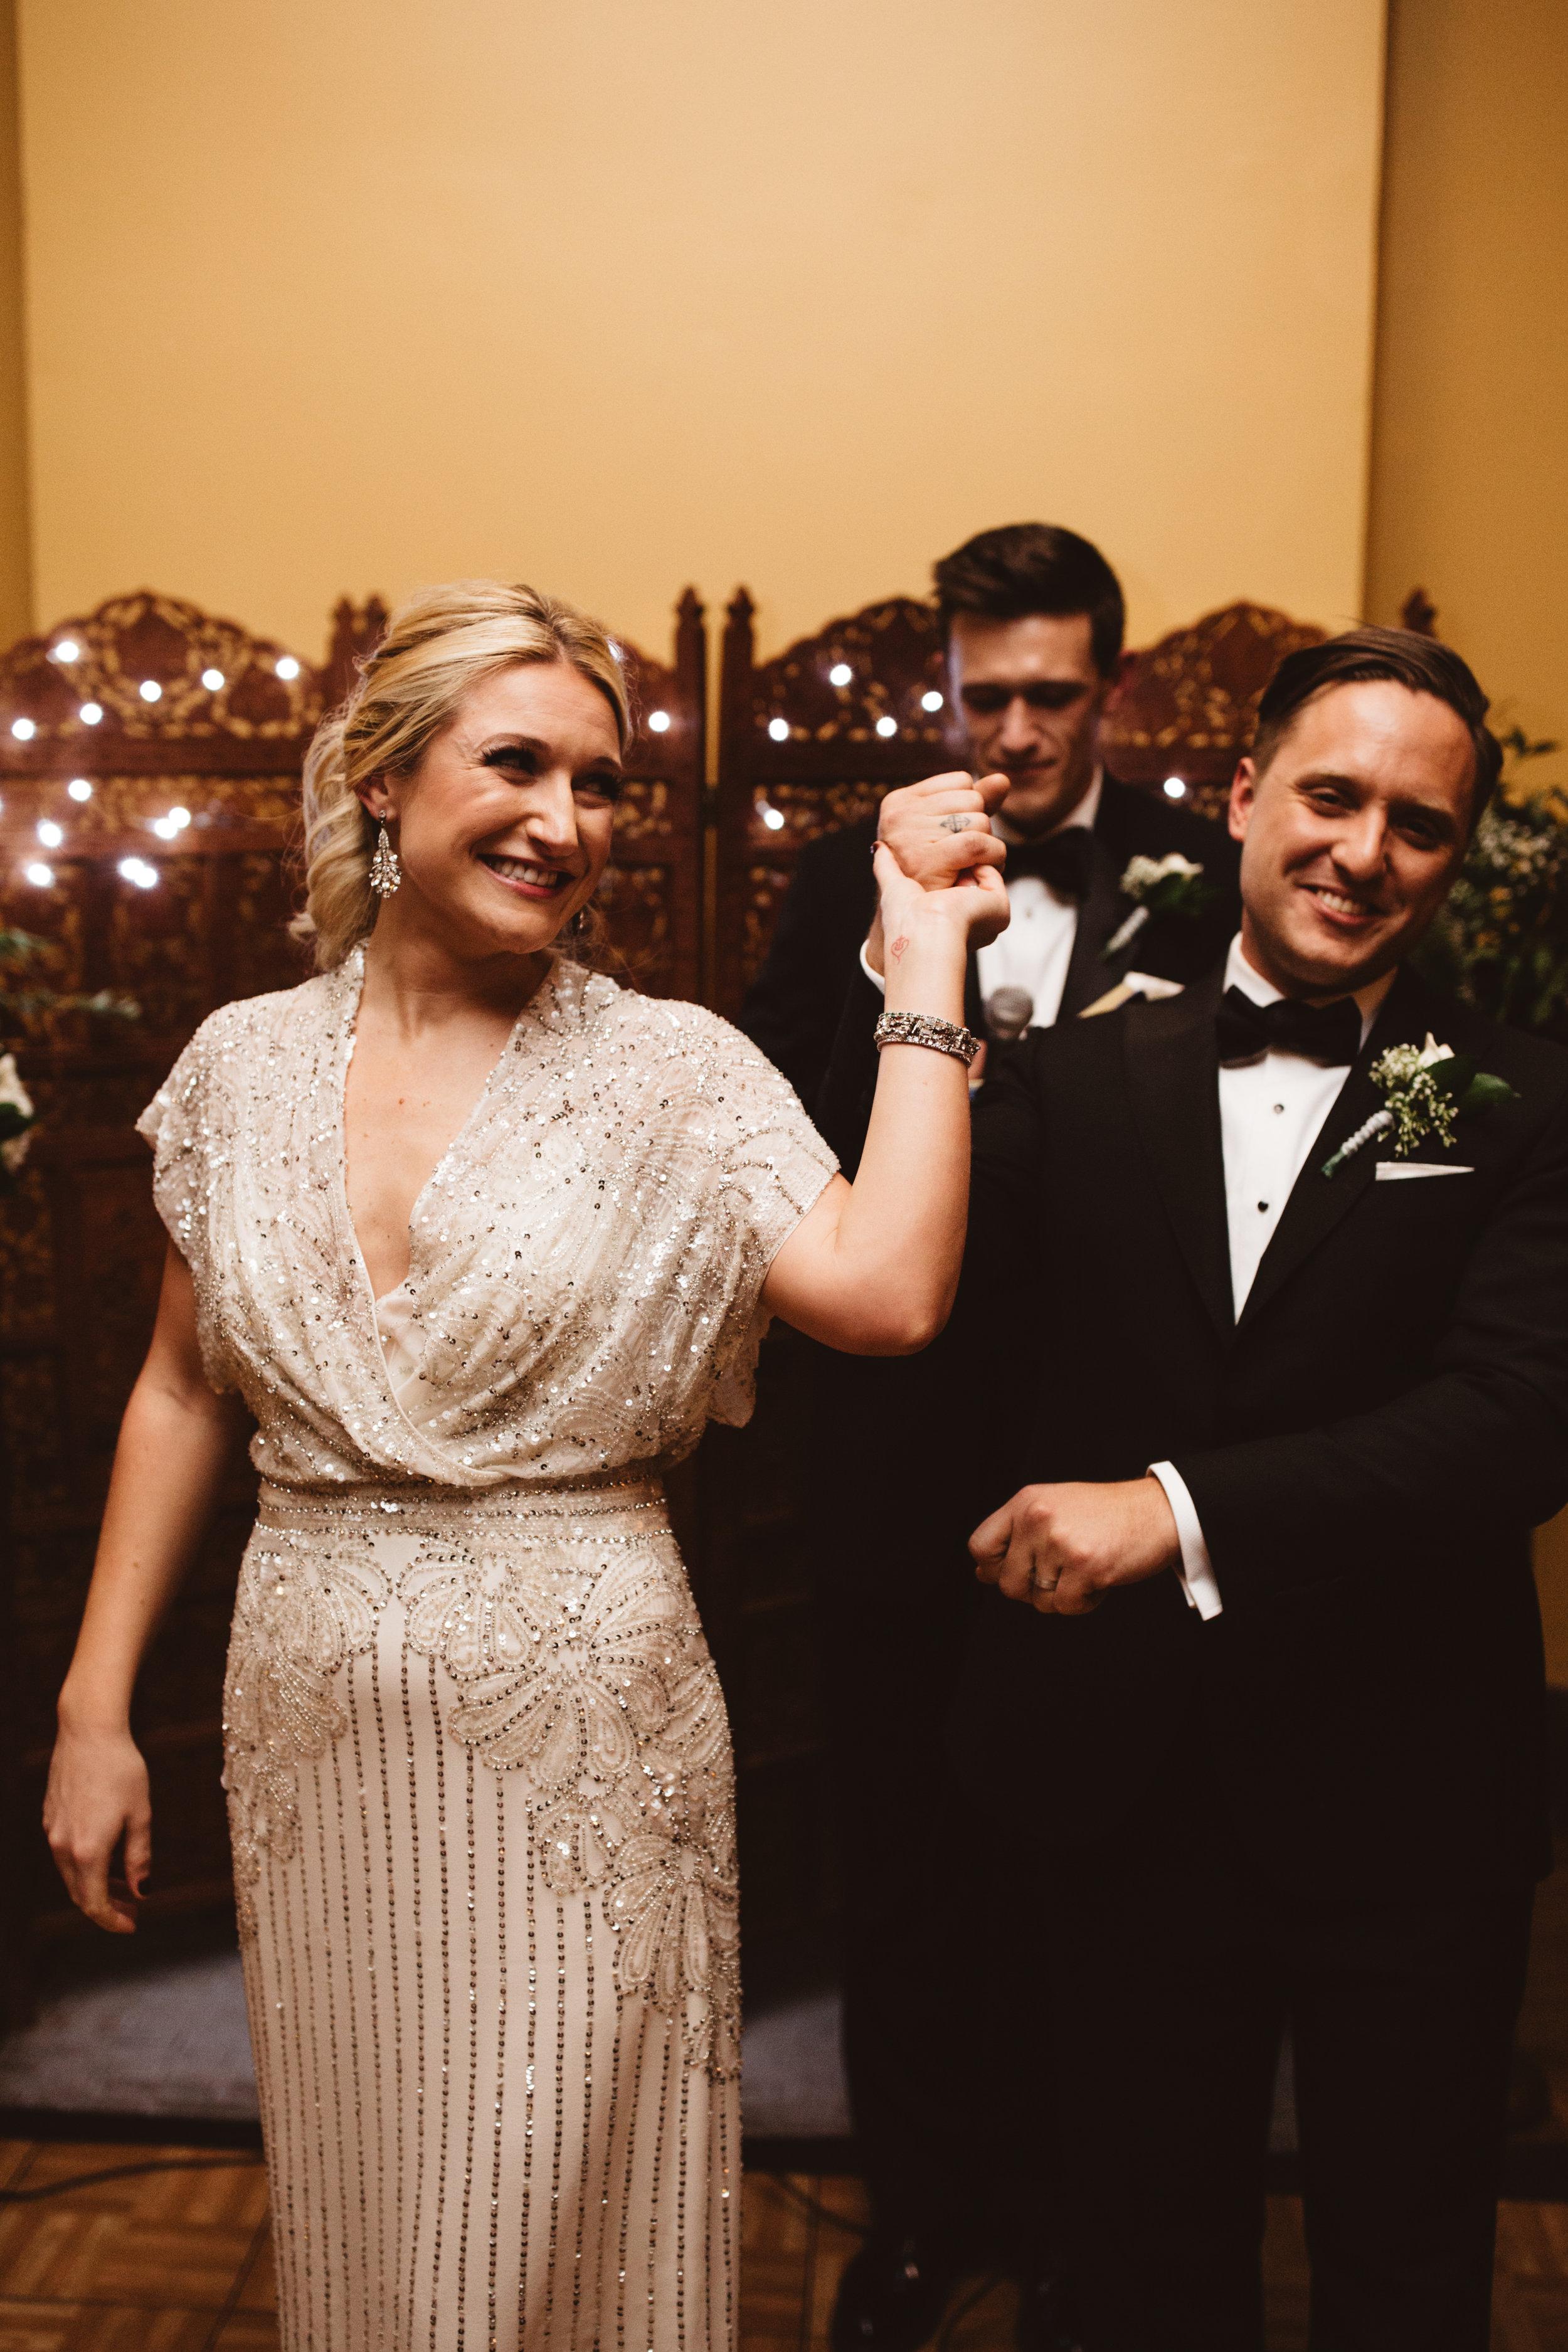 Mattie Bell Photography- Kelly & Zack Wedding Atlanta Brewery -343.jpg